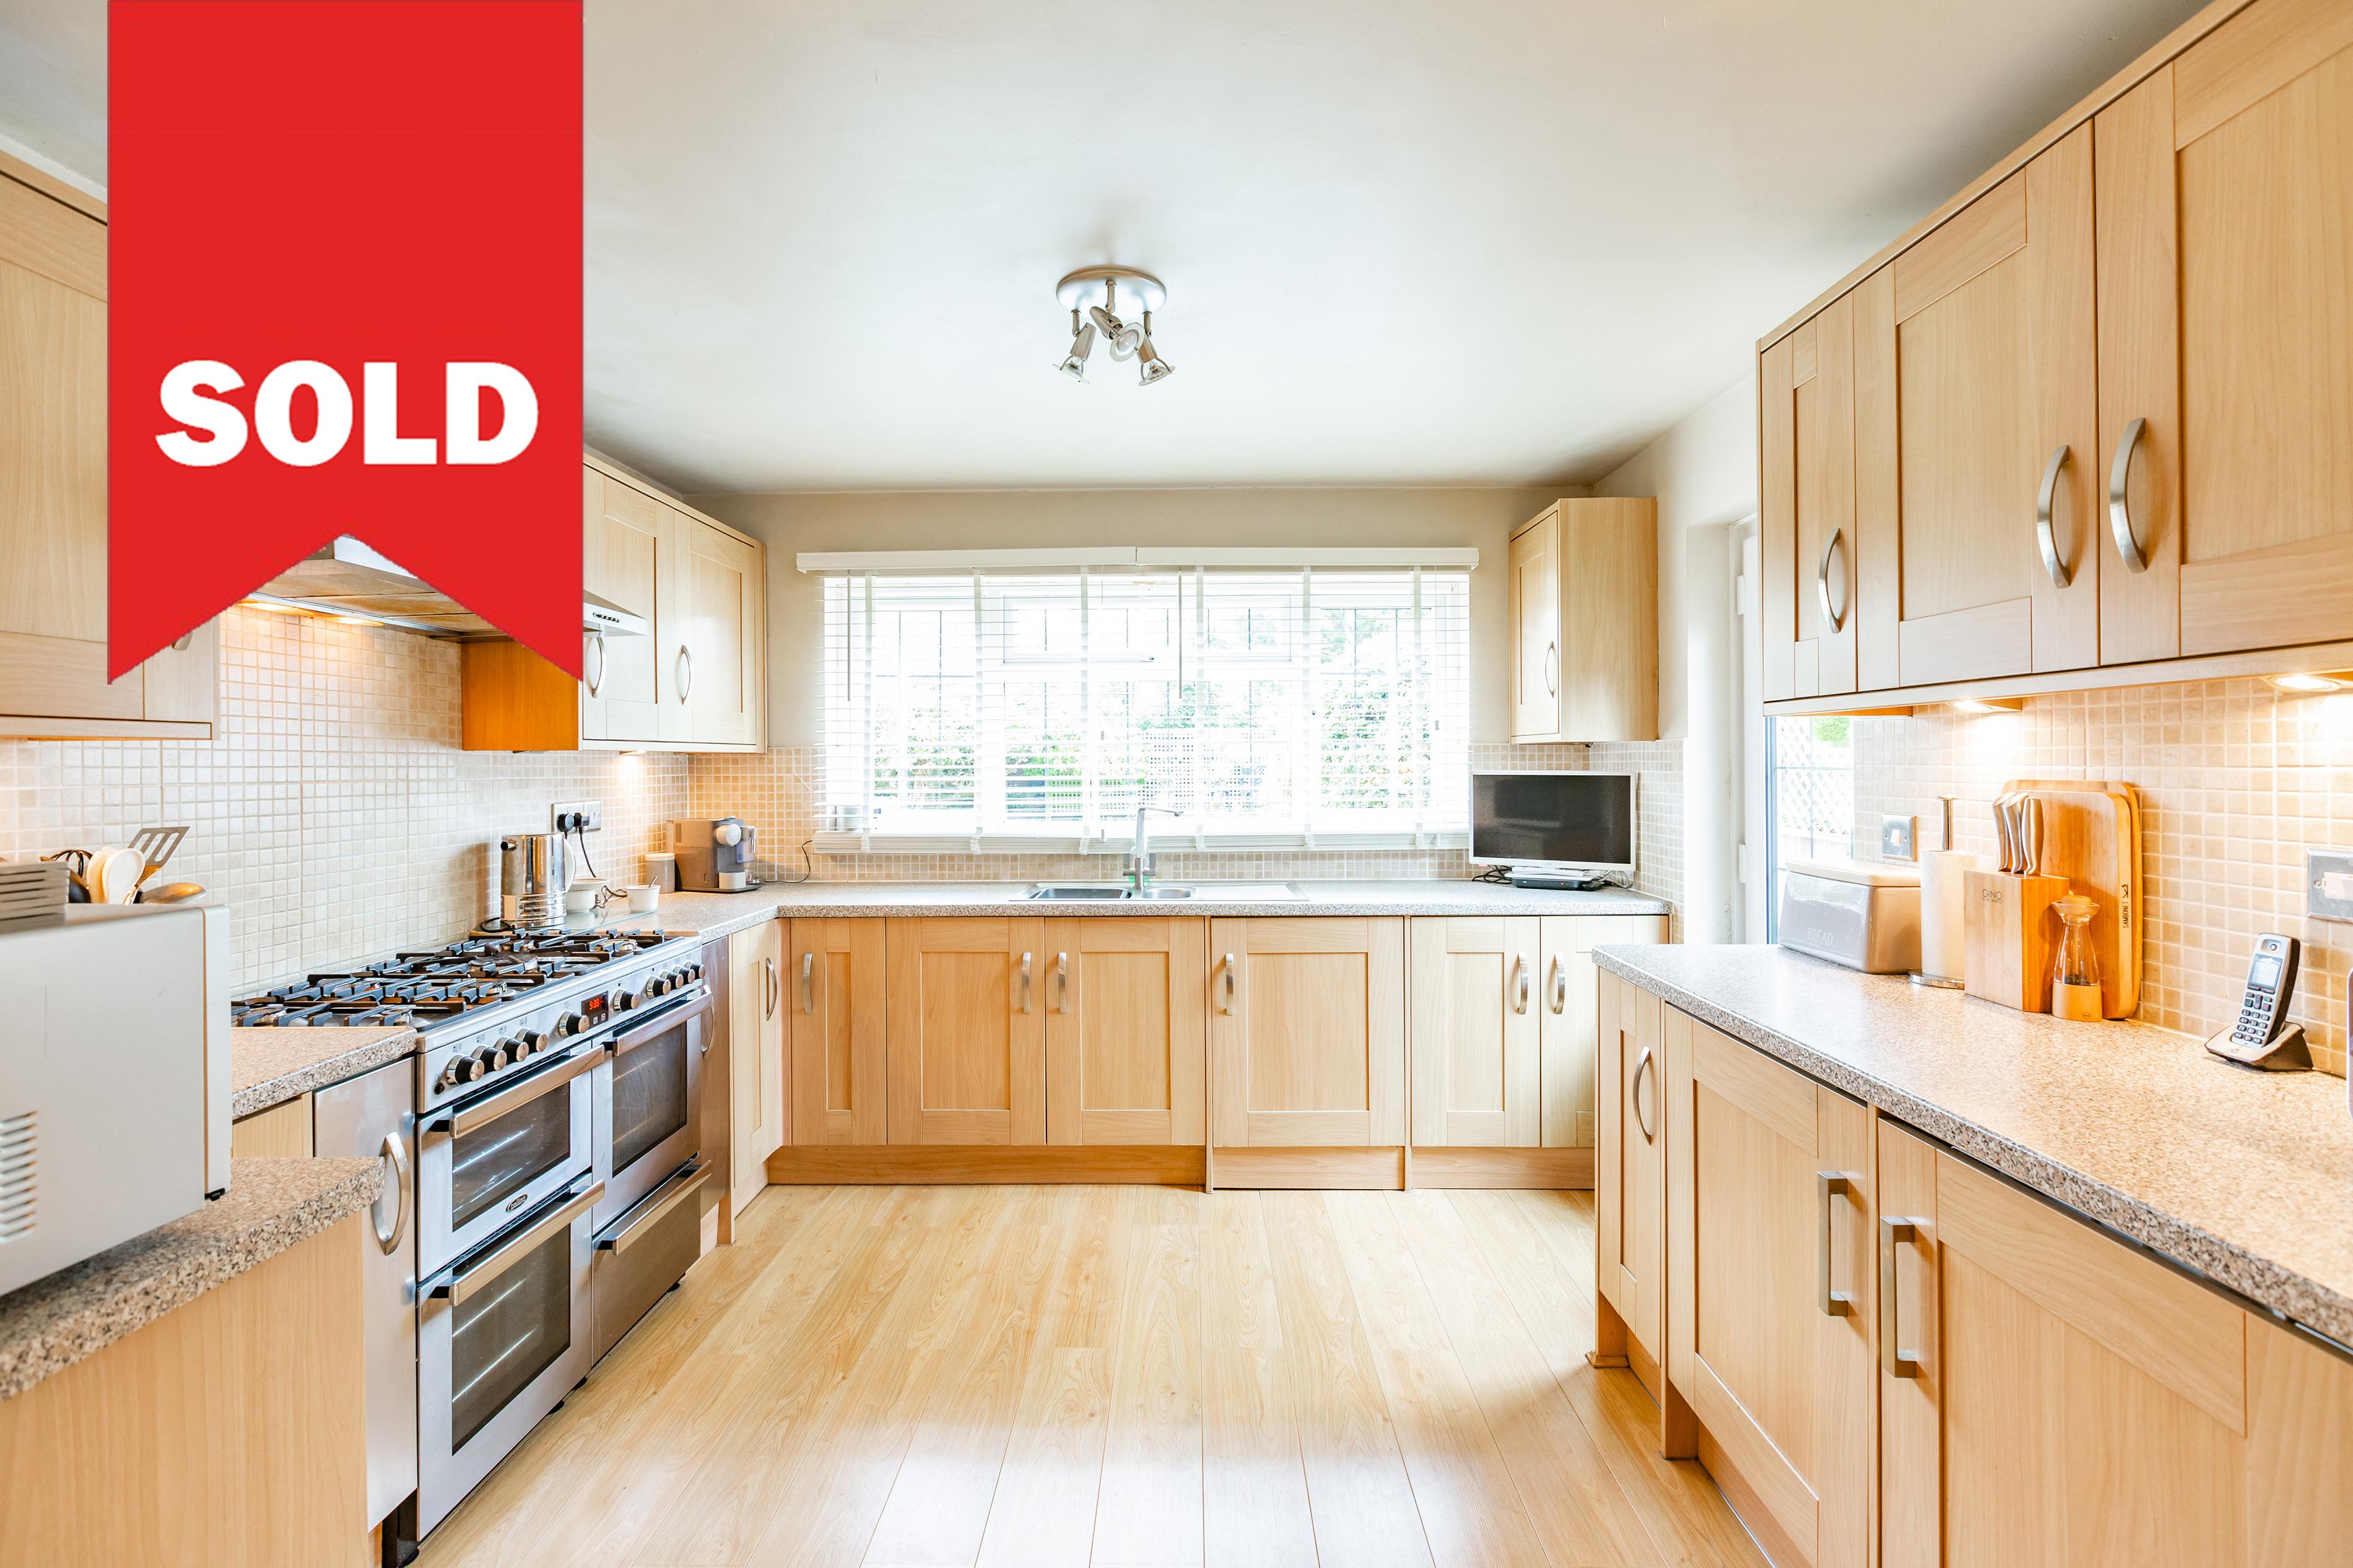 Gravesend - £625,000